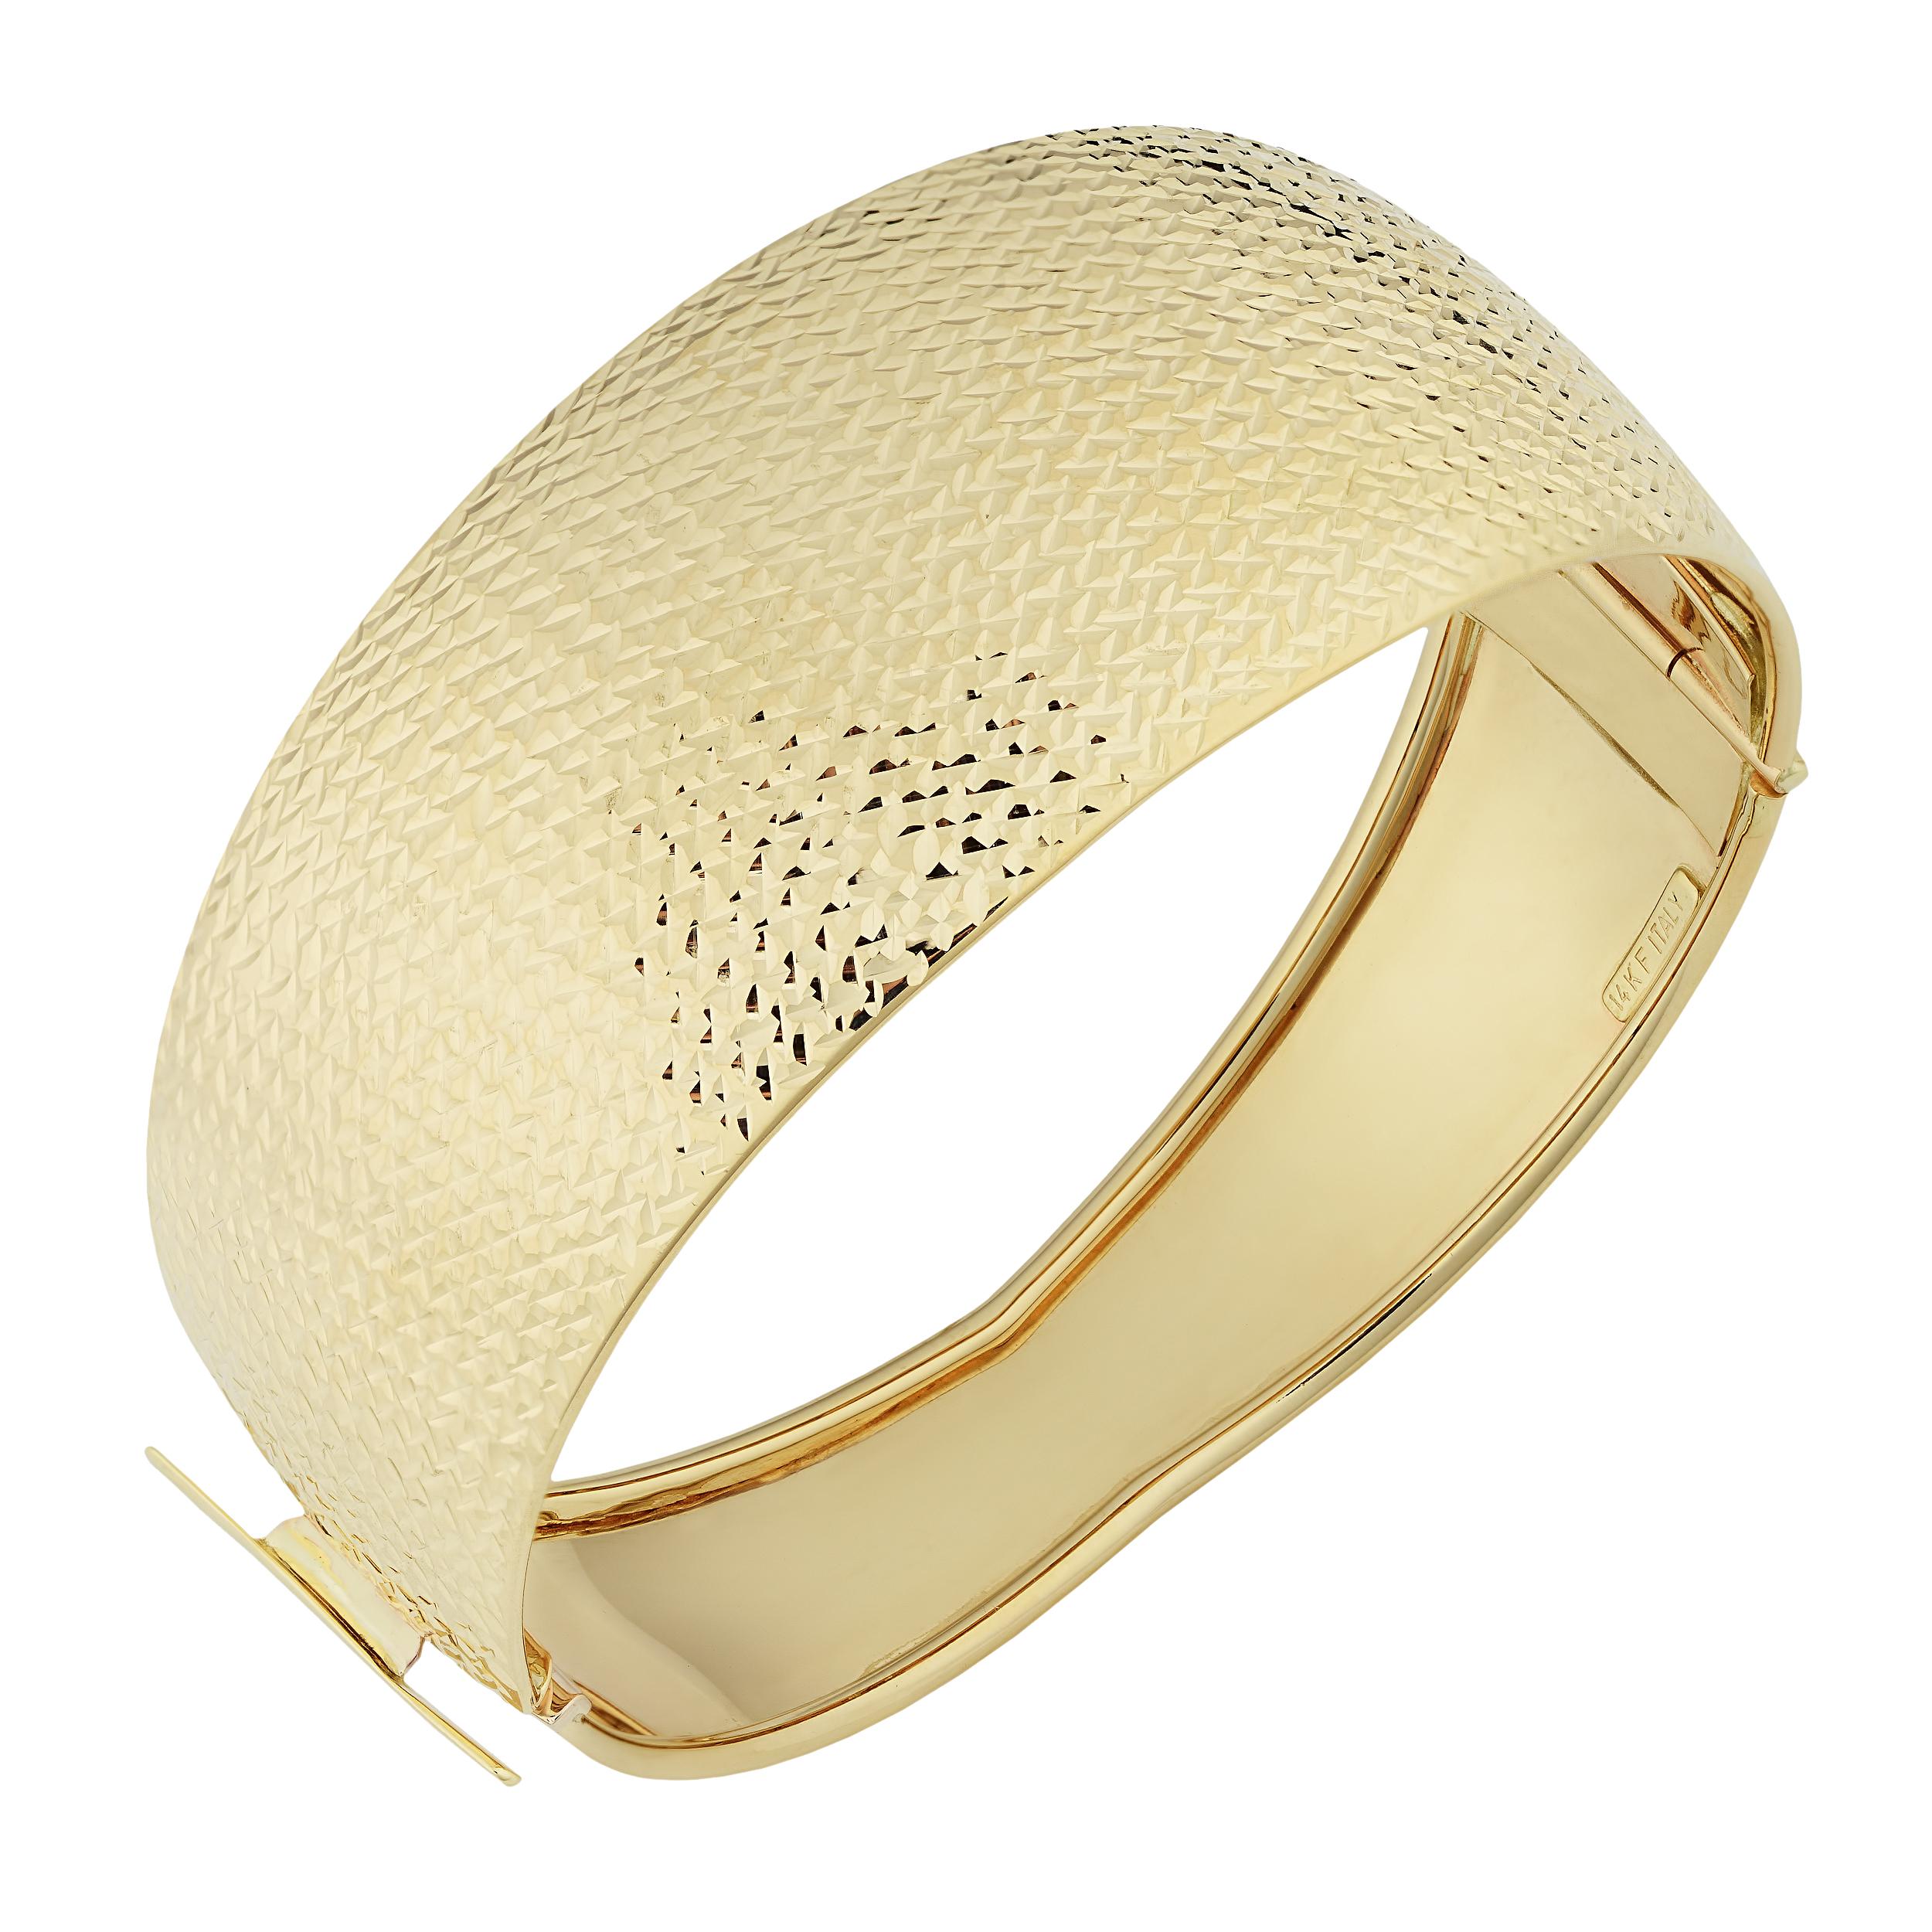 10k Yellow Gold Hinged Women's Cuff Bangle Bracelet, 7.5″